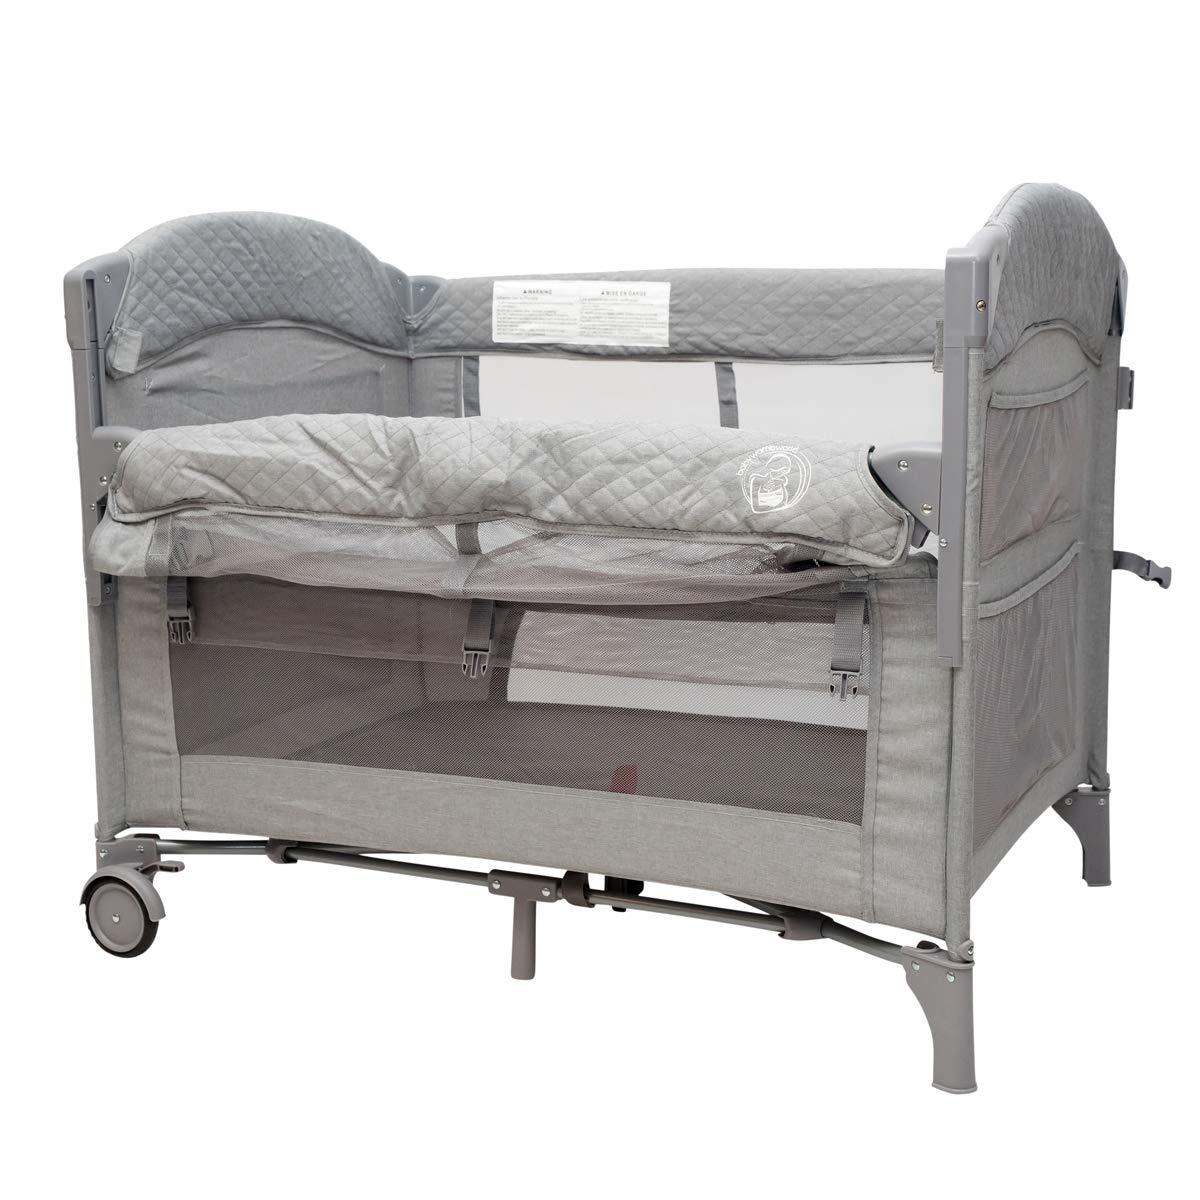 BabyWombWorld Premium Bedside Sleeper Portable